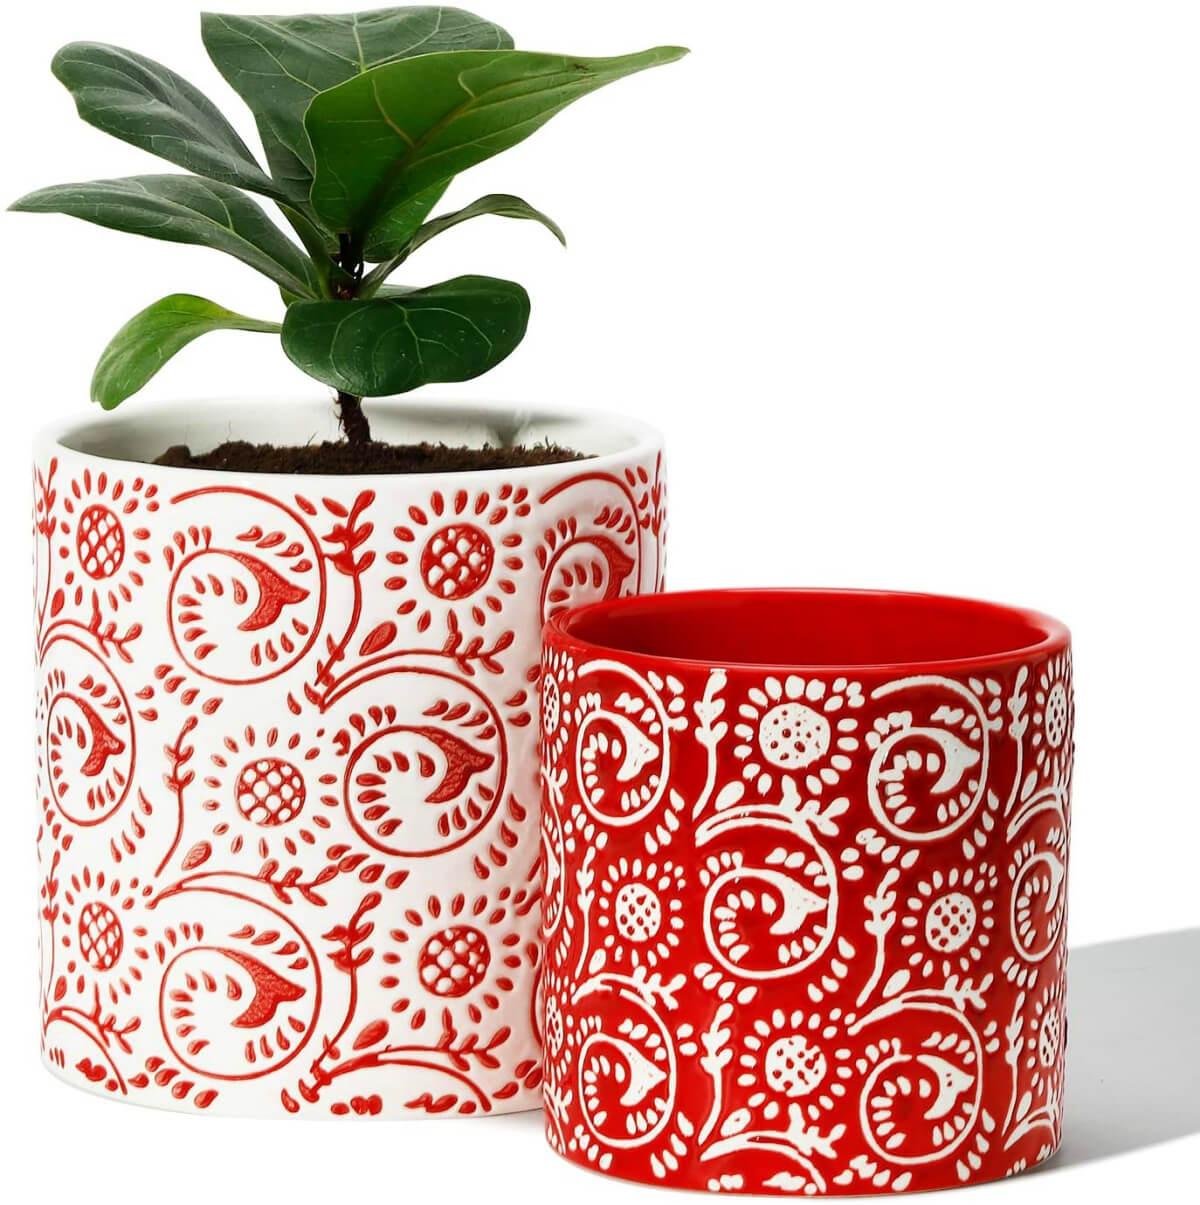 My Favorite Plant Pot Sets Under $30 At Amazon